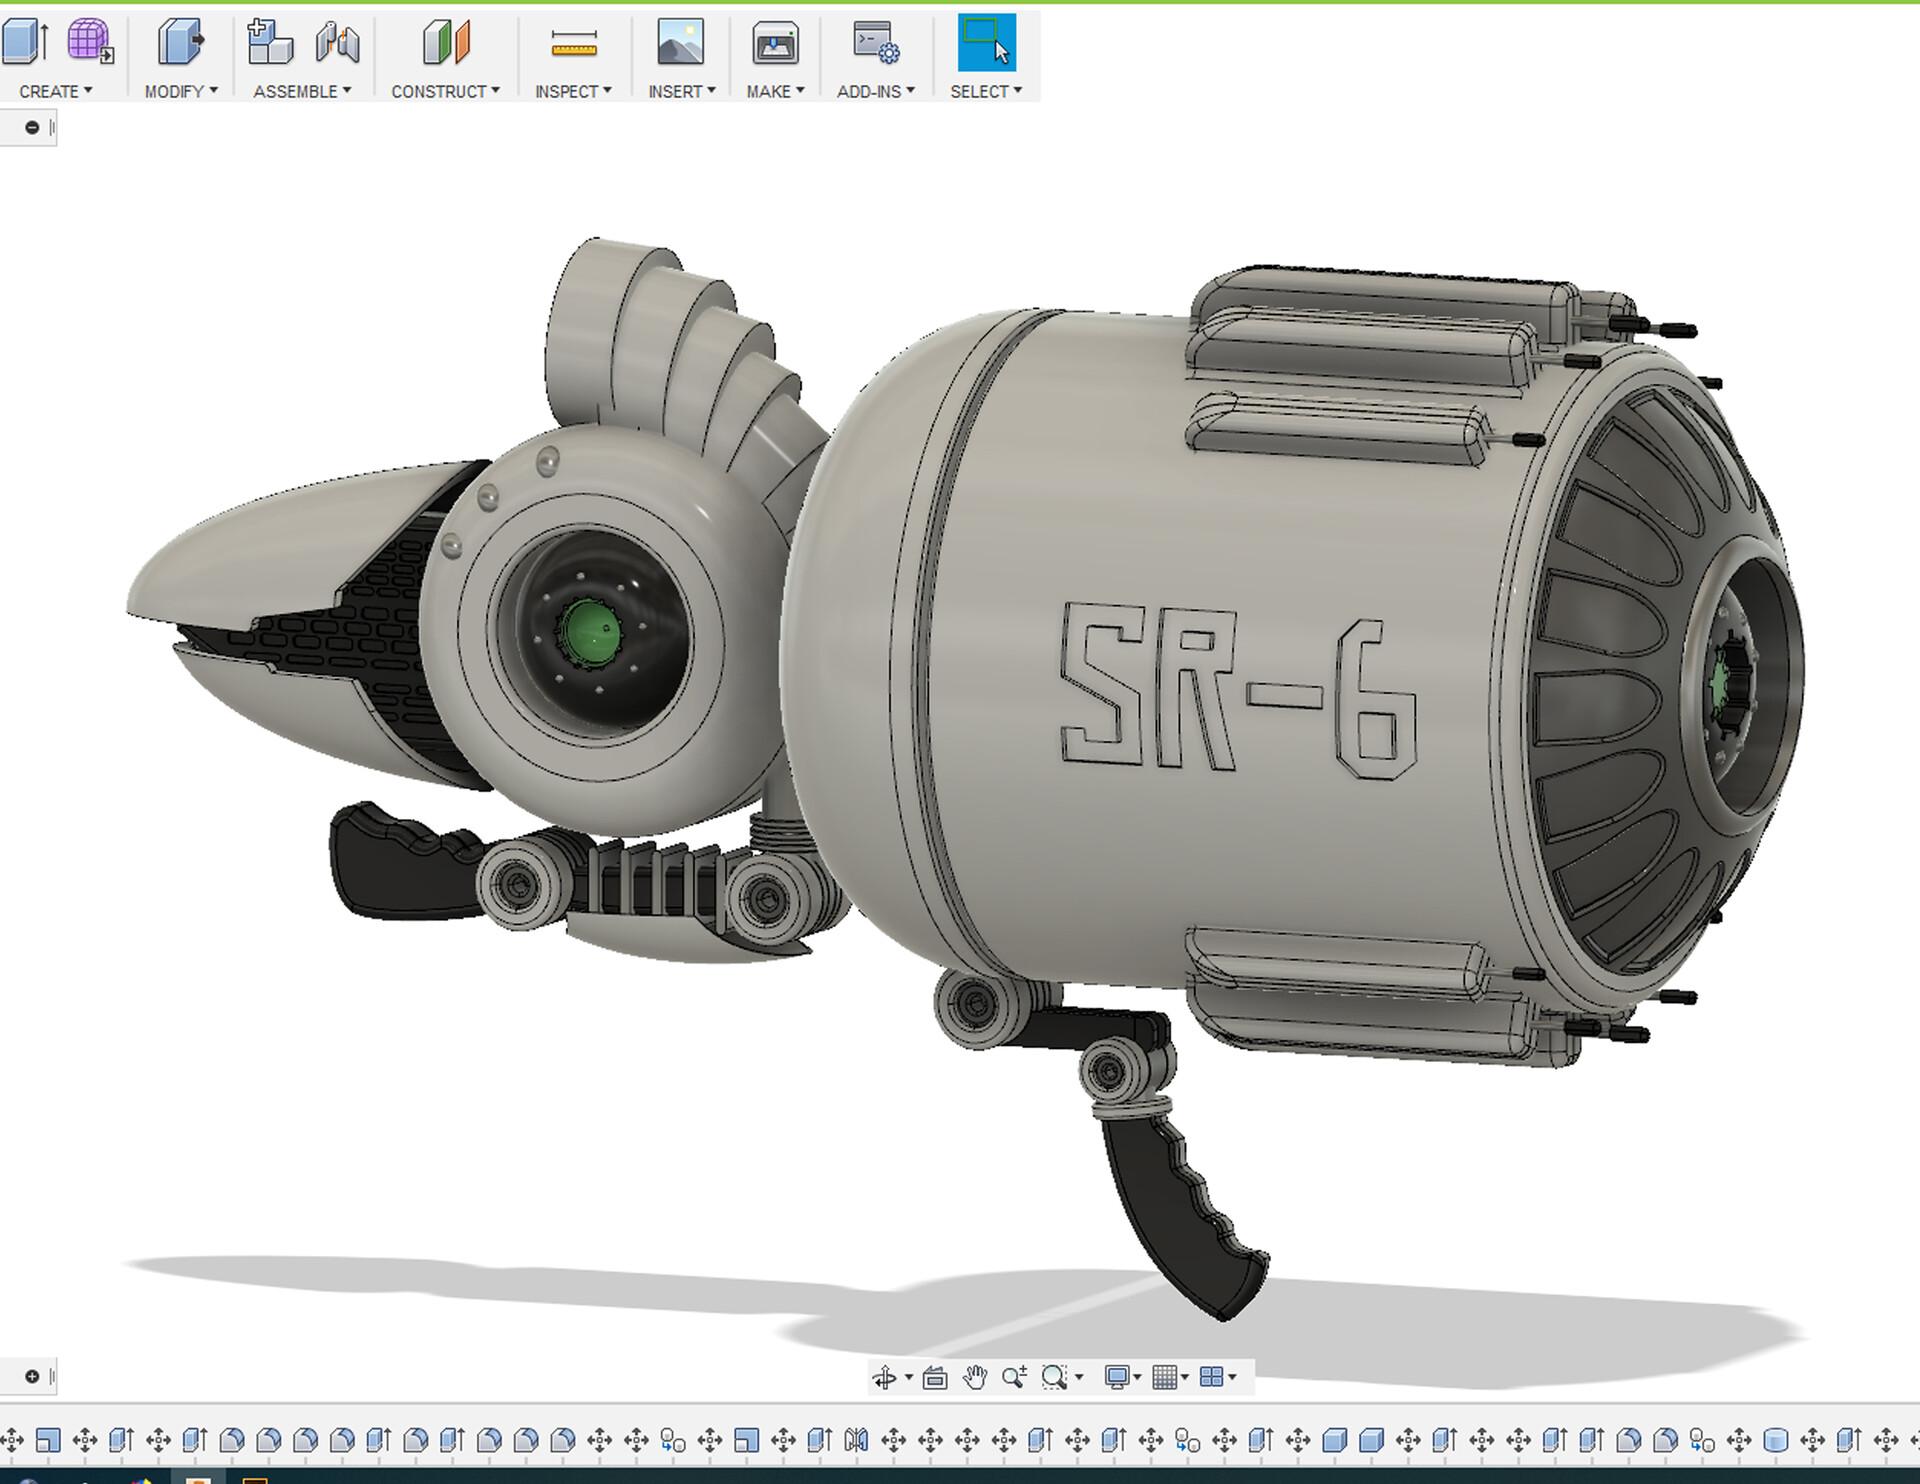 ArtStation - 3D Fusion 360, Elton Mike Salaño